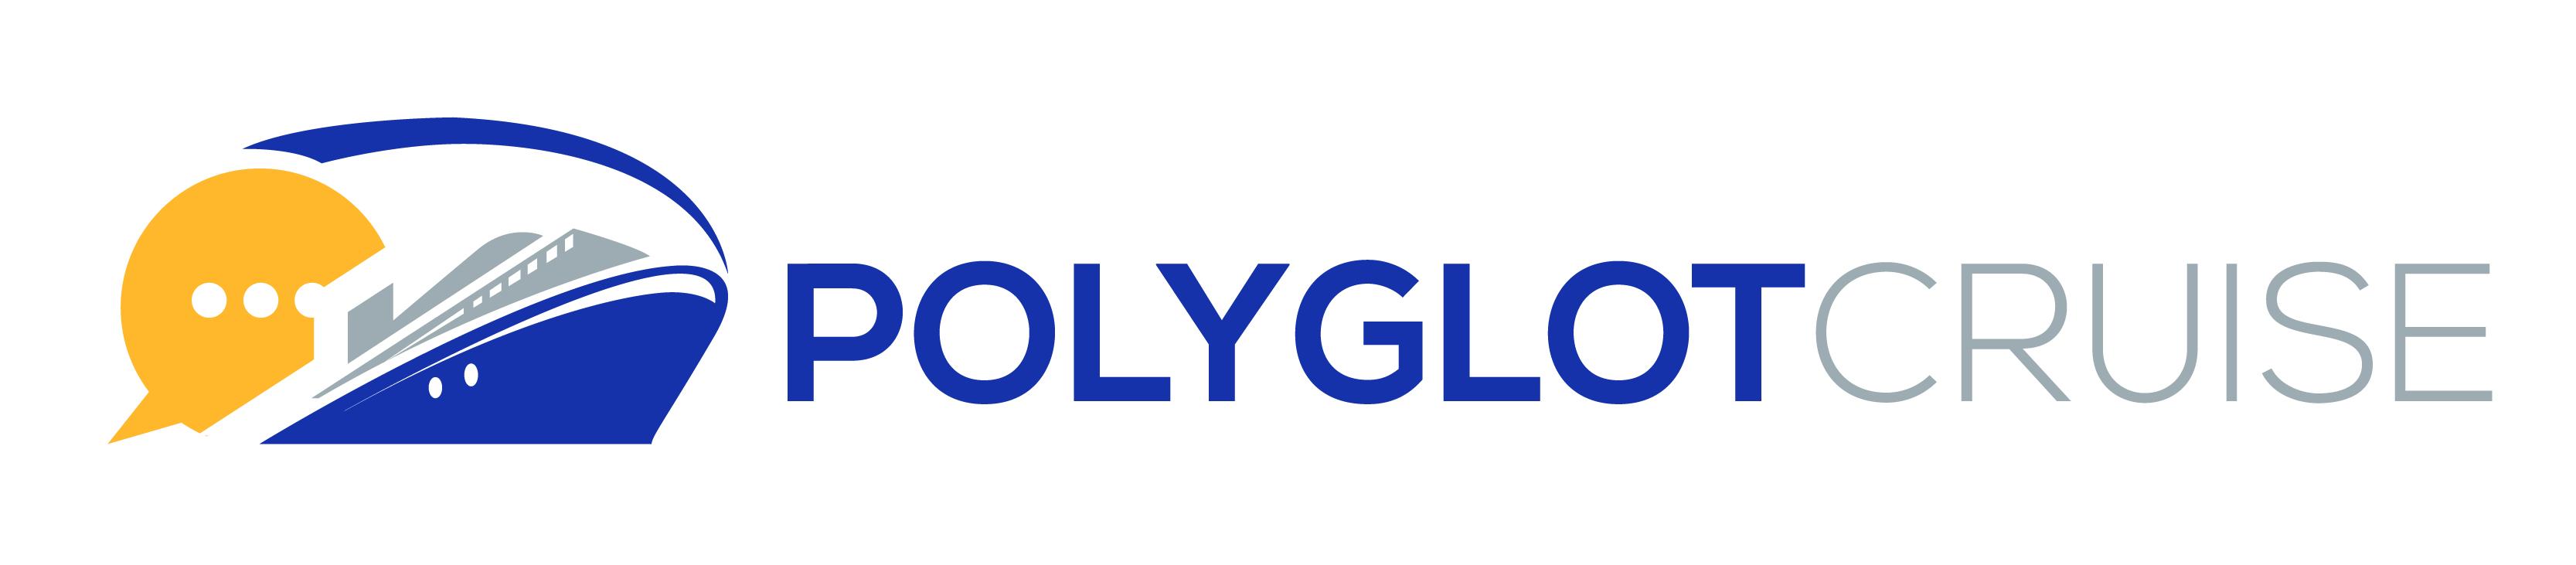 Polyglot Cruise